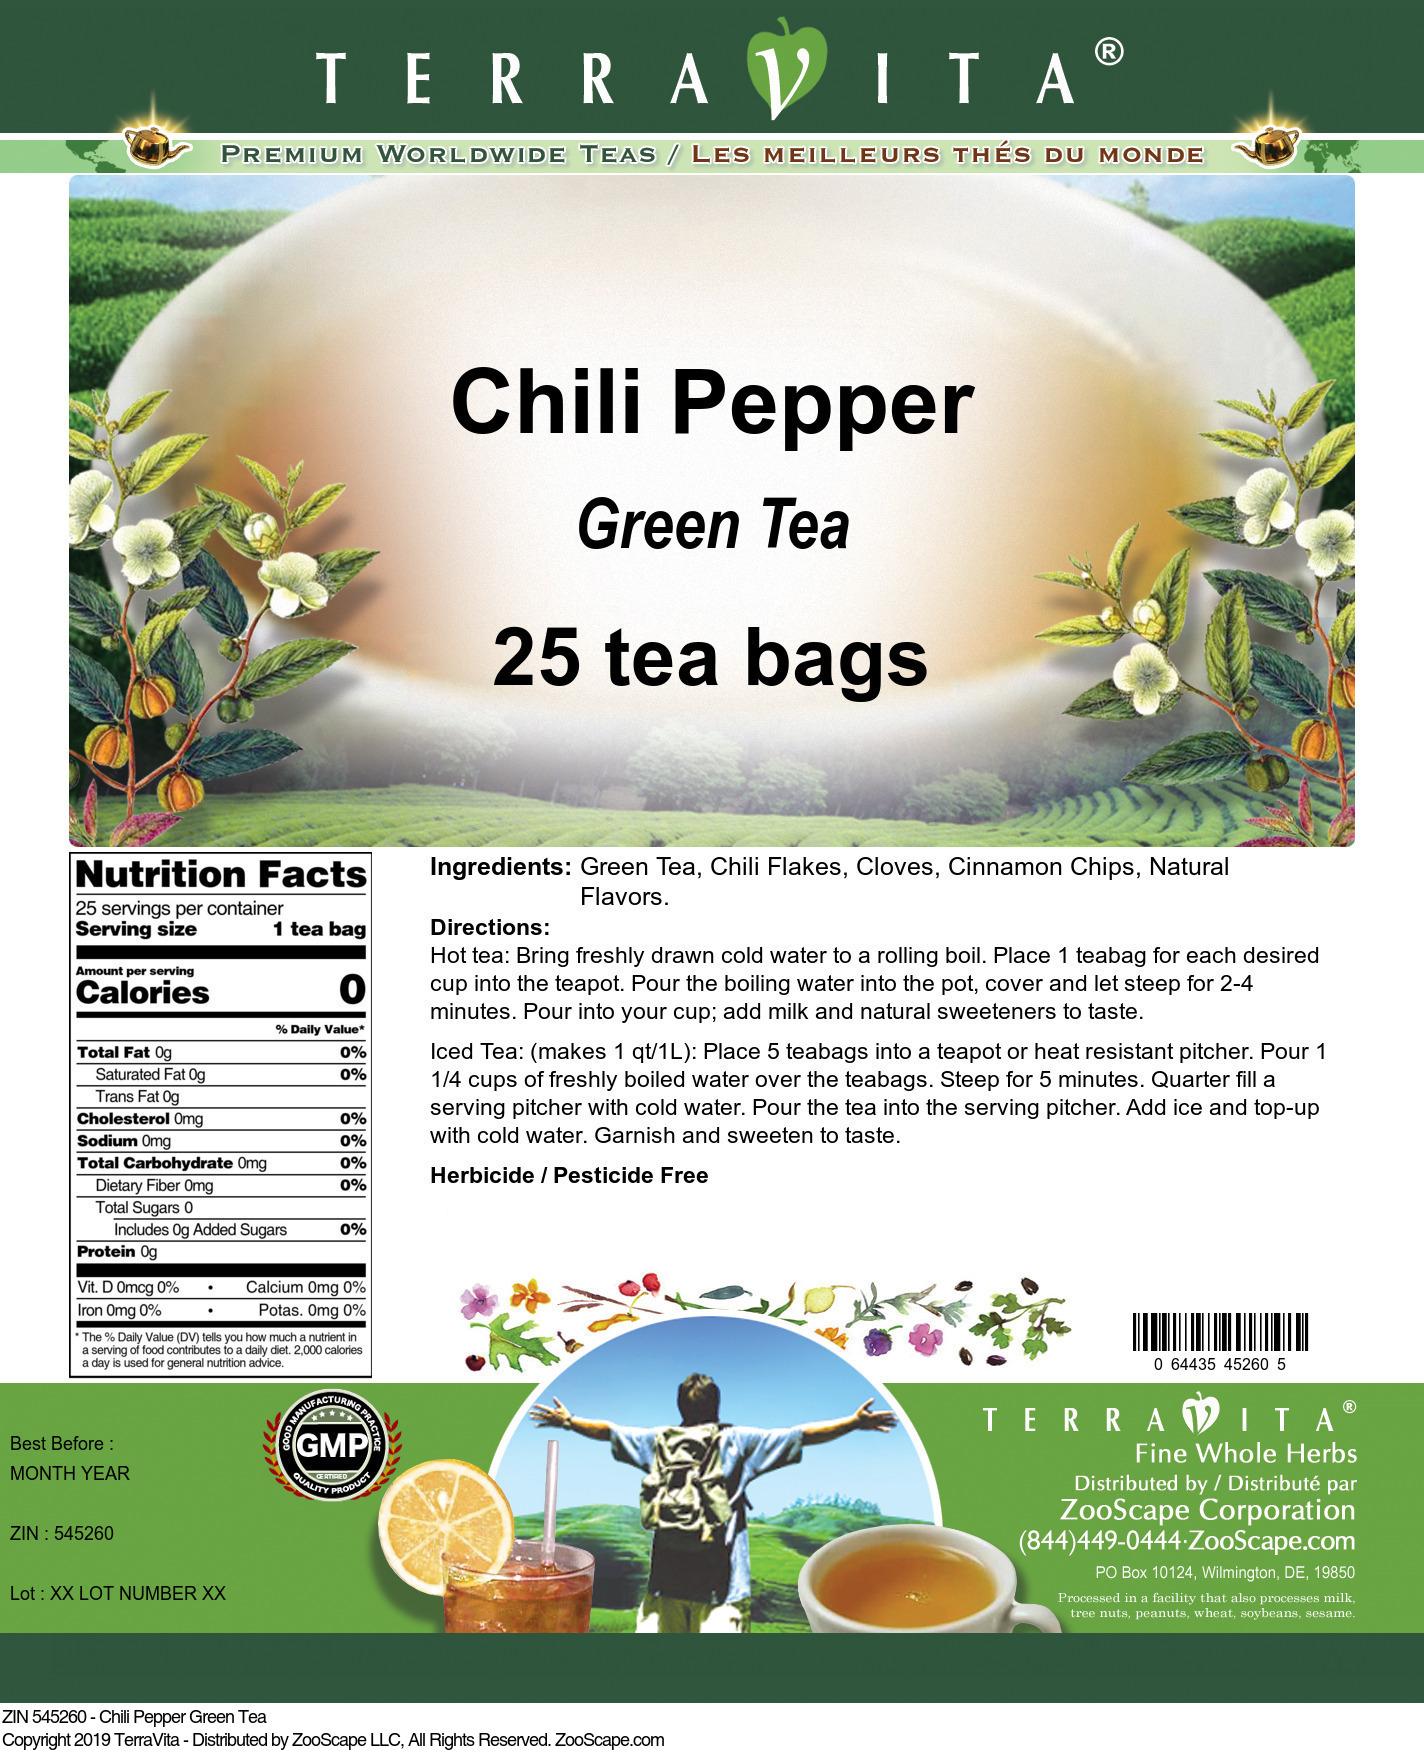 Chili Pepper Green Tea